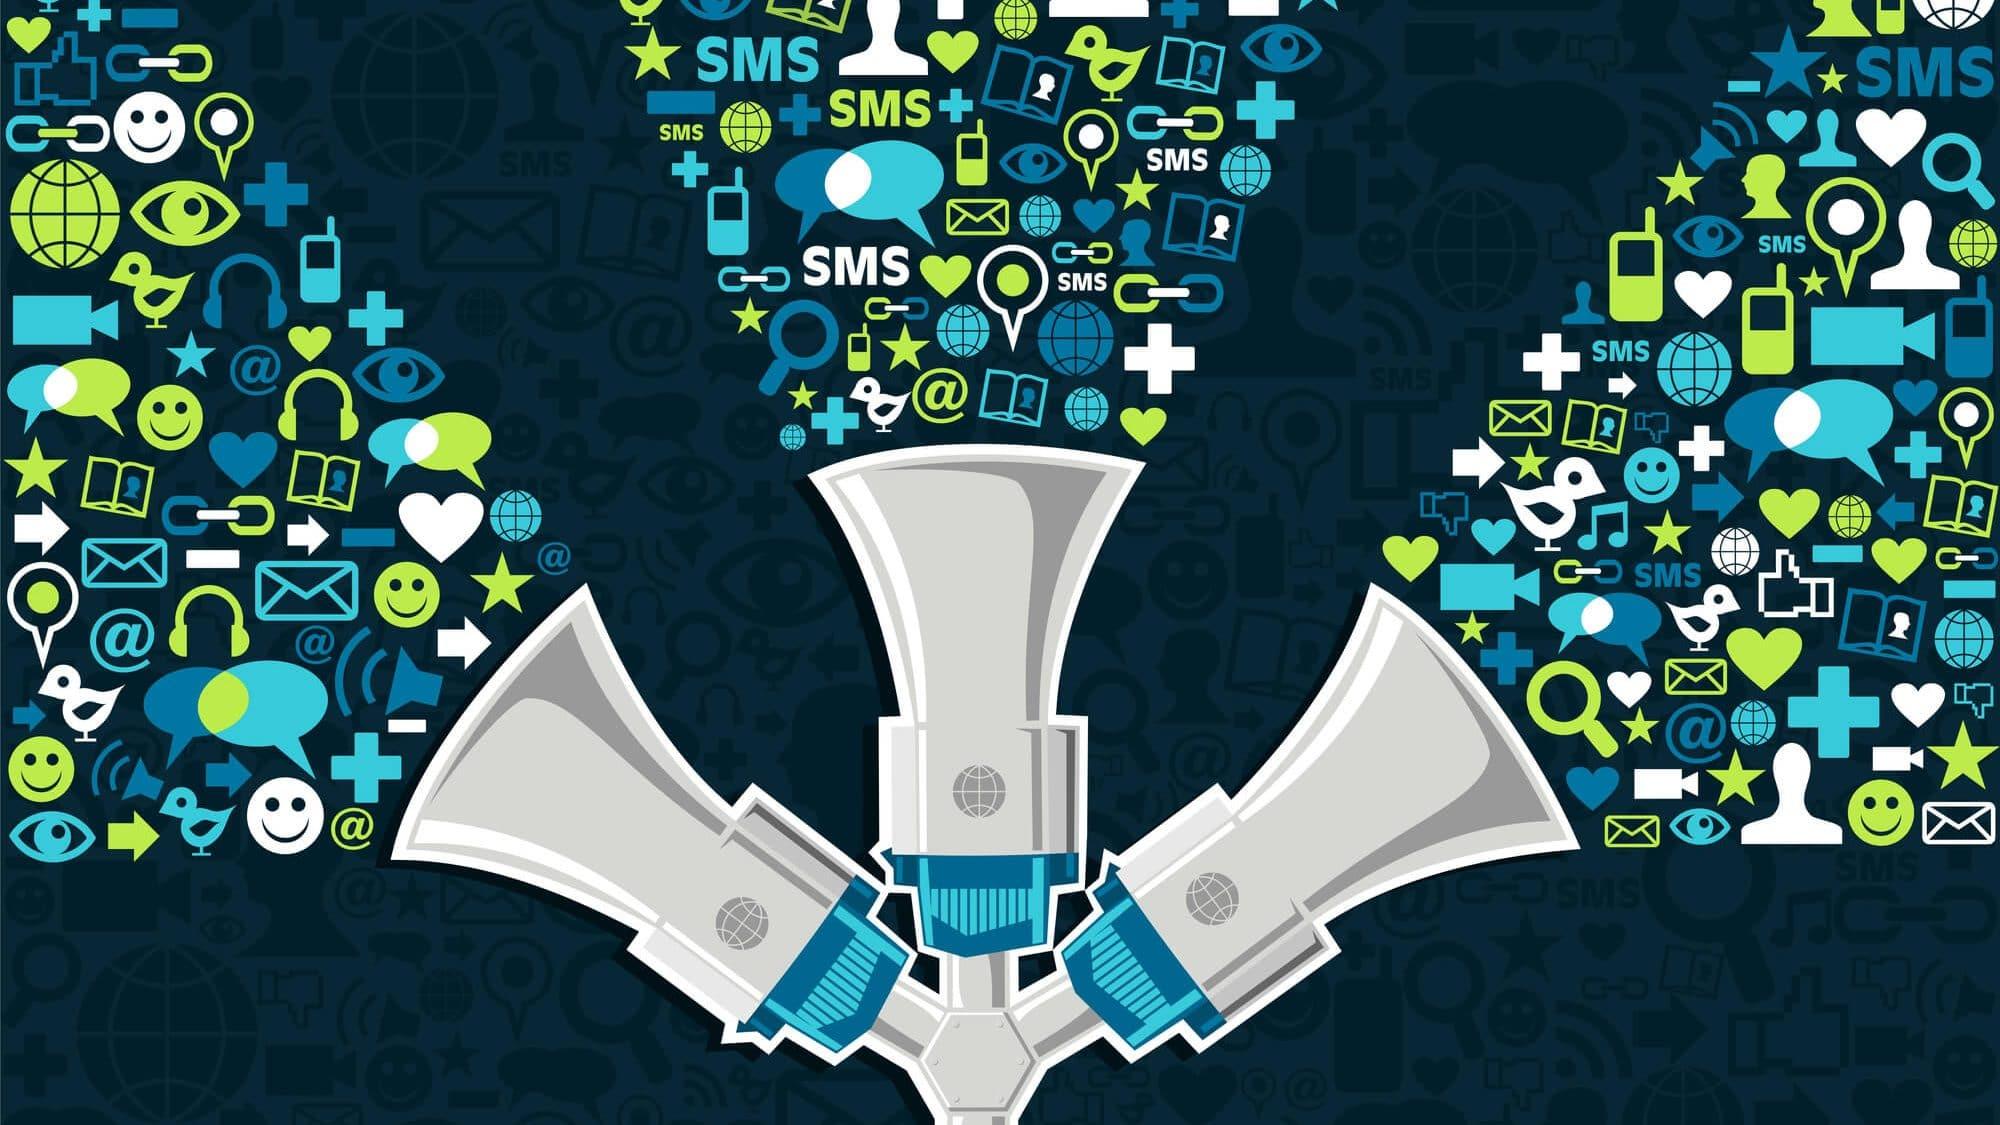 white label social media marketing services - Big Easy SEO